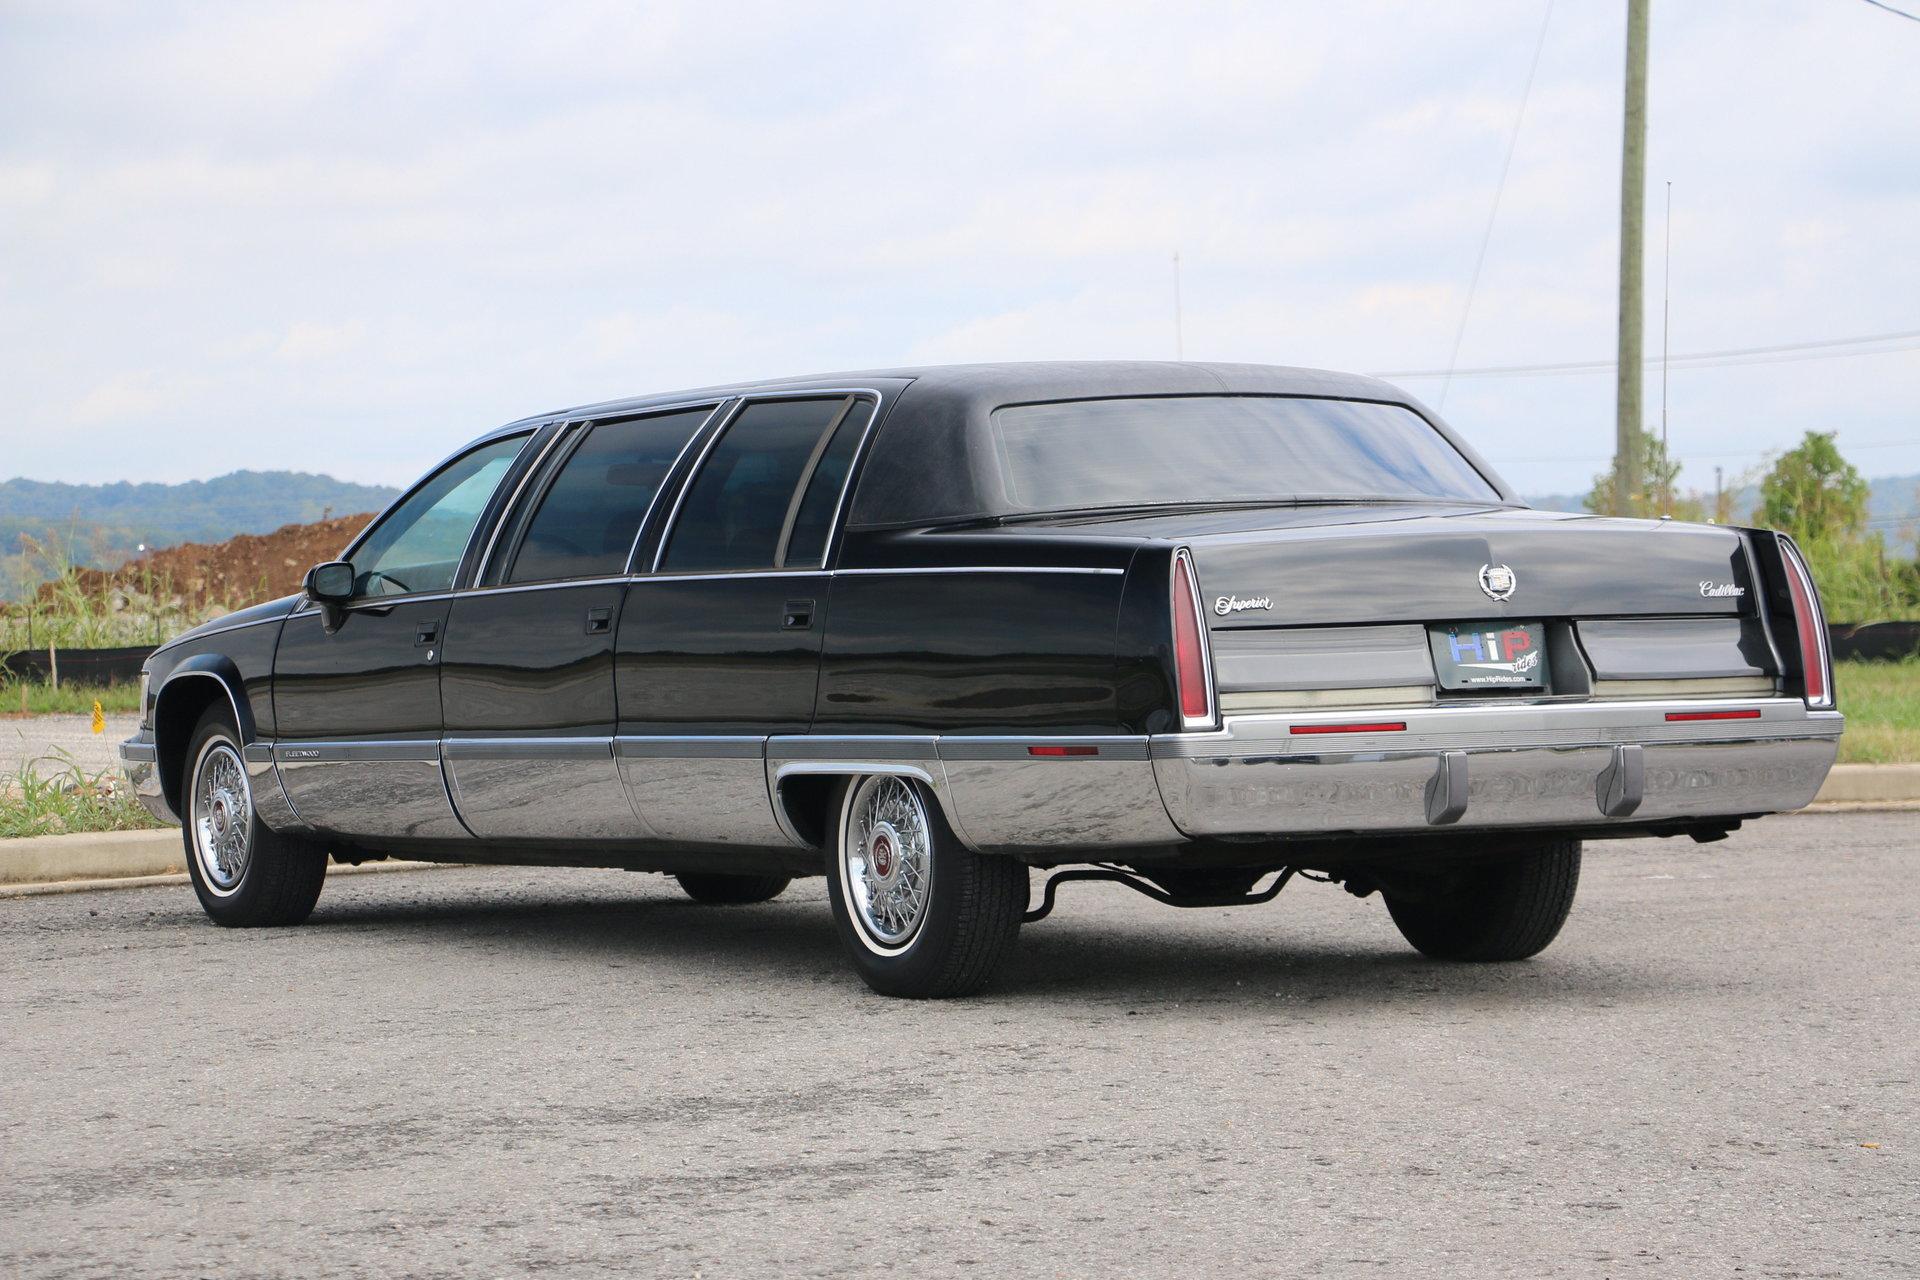 1993 Cadillac Fleetwood Limousine for sale #75352 | MCG